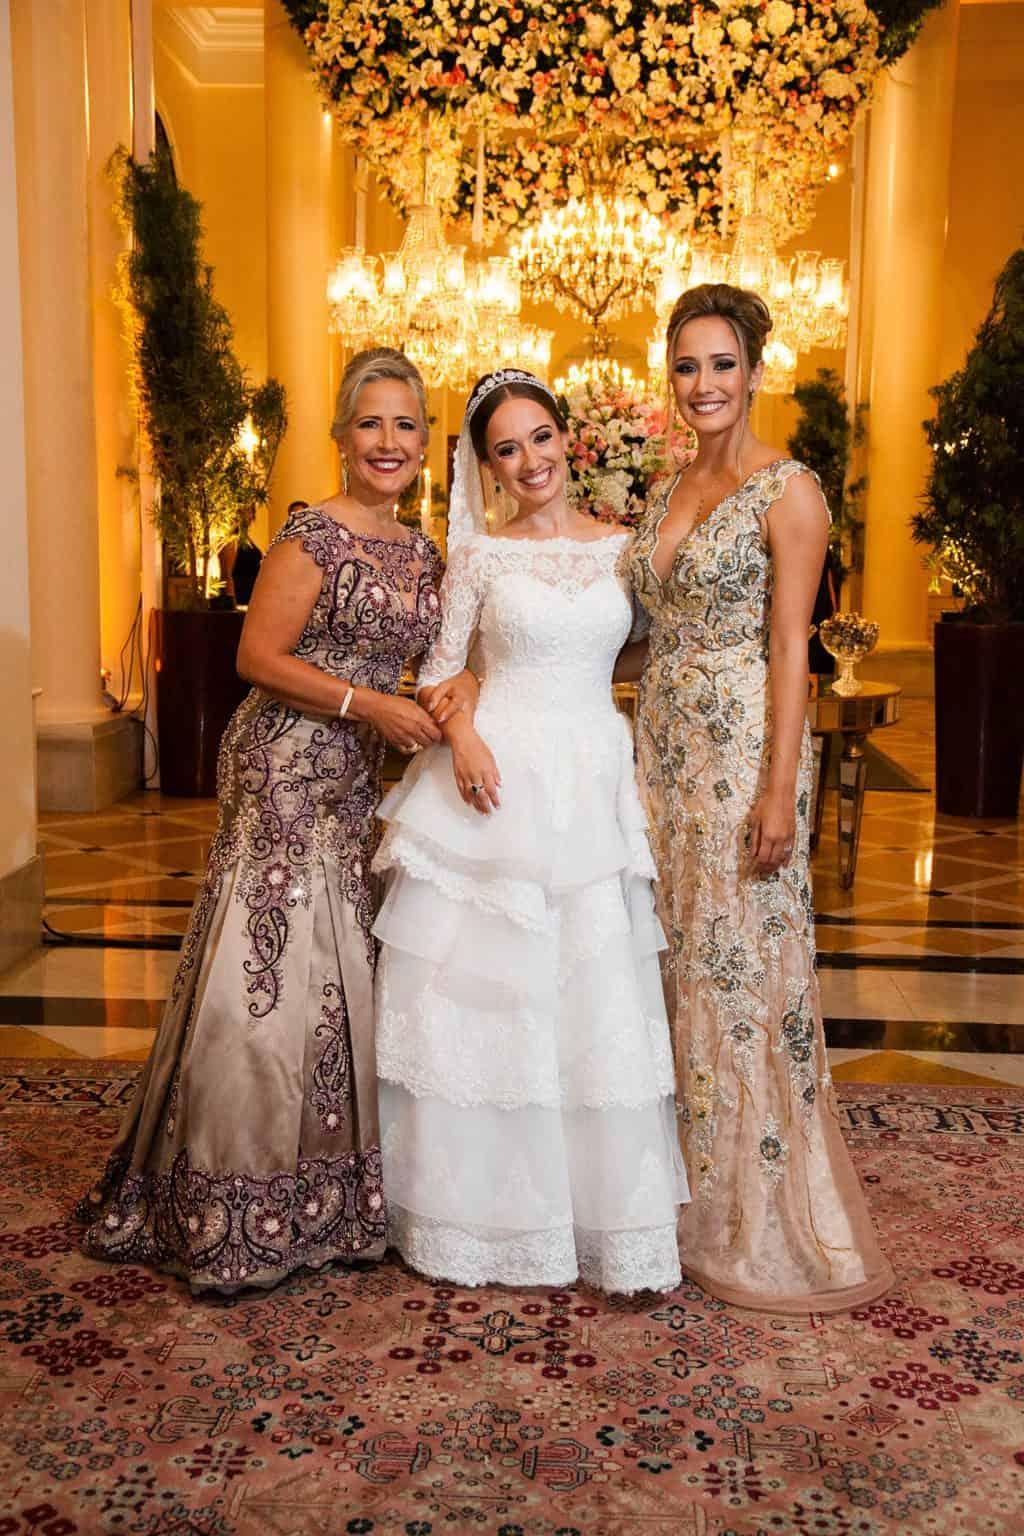 Casamento-Clássico-Casamento-tradicional-Copacabana-Palace-Monica-Roias-Ribas-Foto-e-Vídeo-Tuanny-e-Bernardo-CaseMe-2